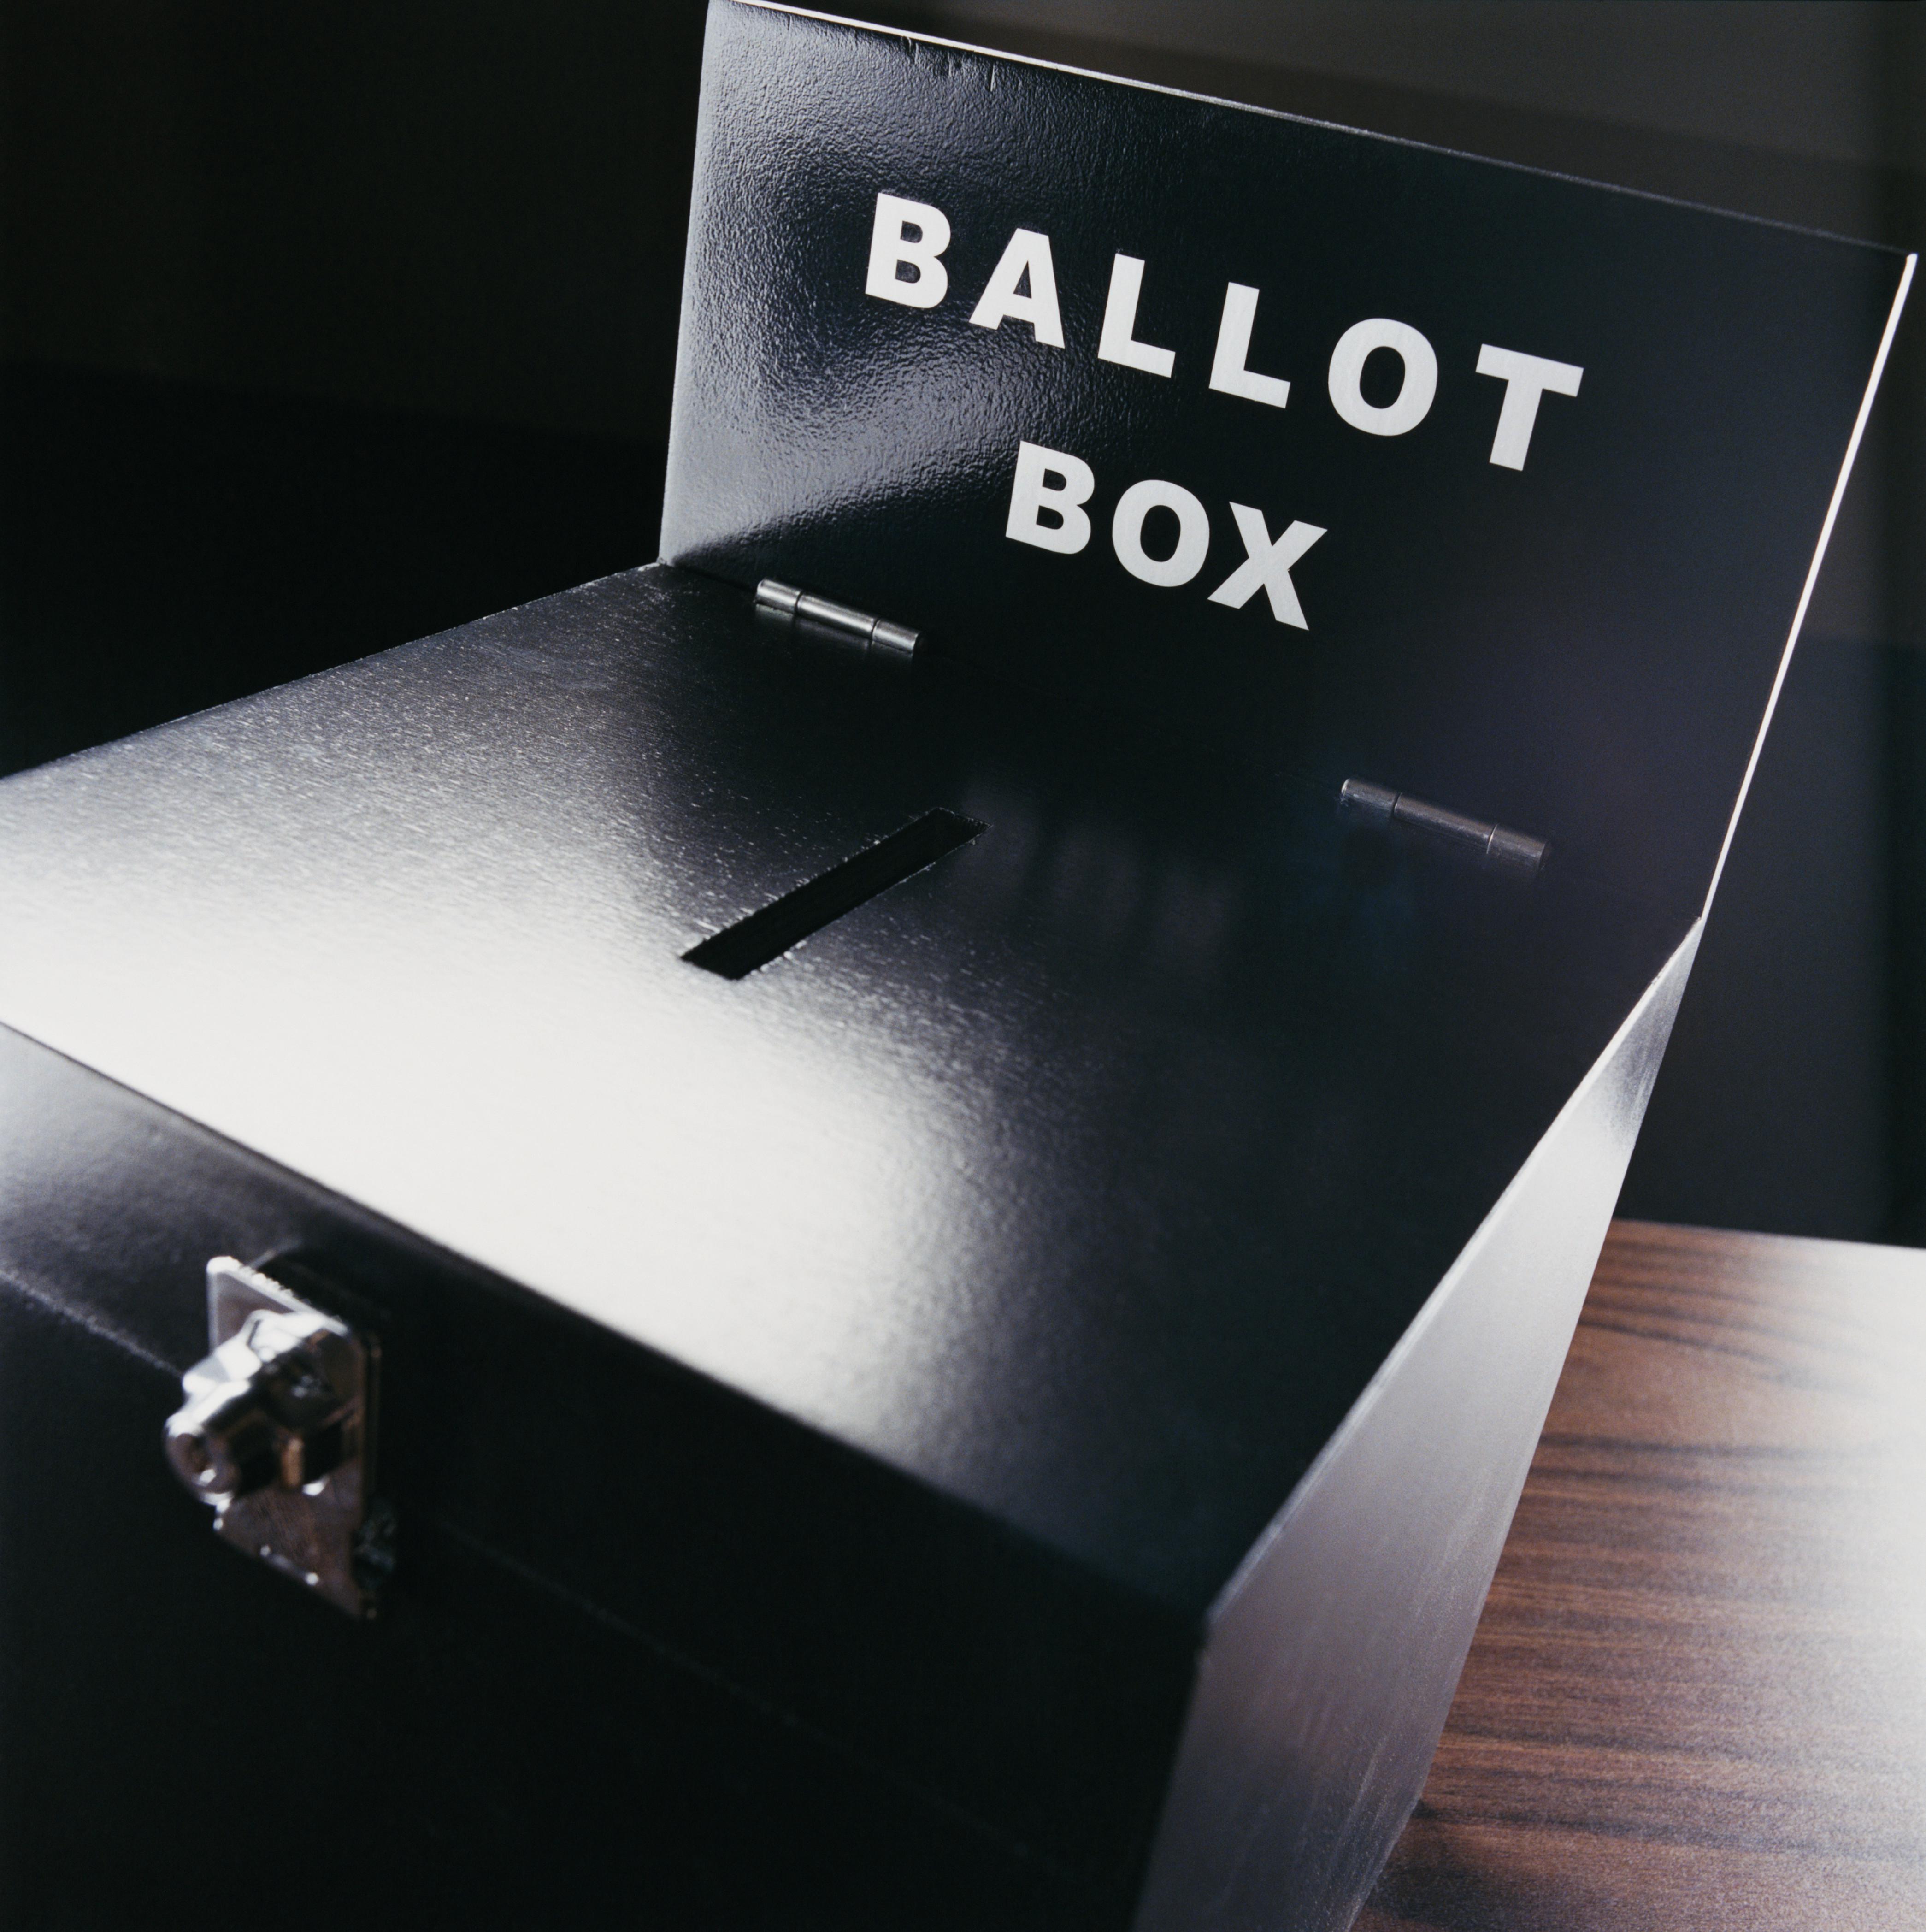 Studio Shot of a Ballot Box